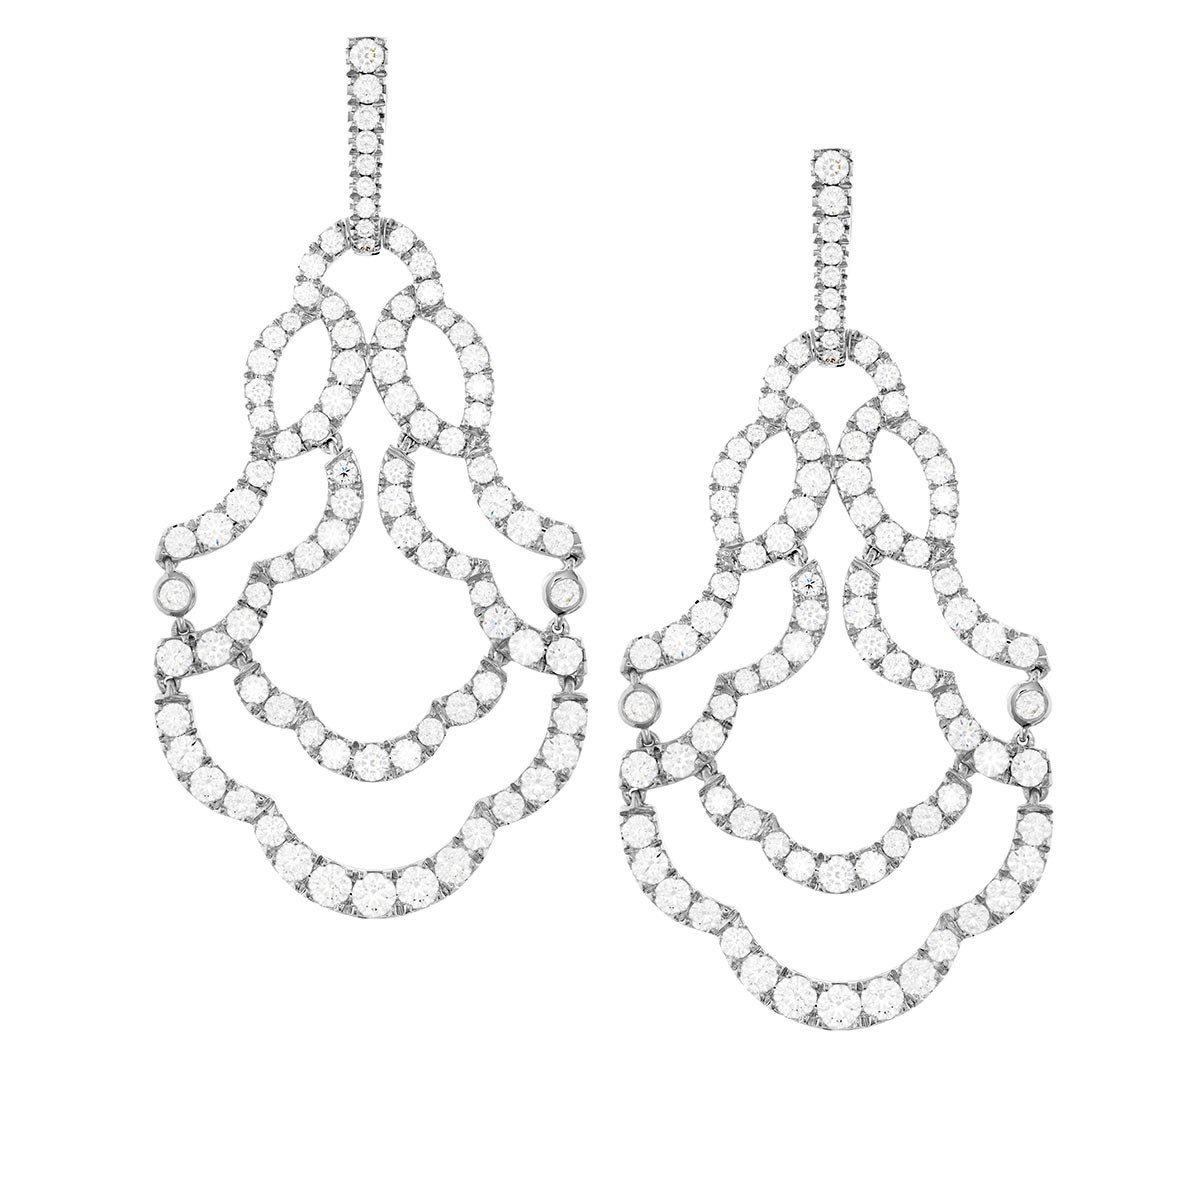 Lorelei鑽石耳環,18K白金鑽石總重6.645克拉,81萬9,000元起。...